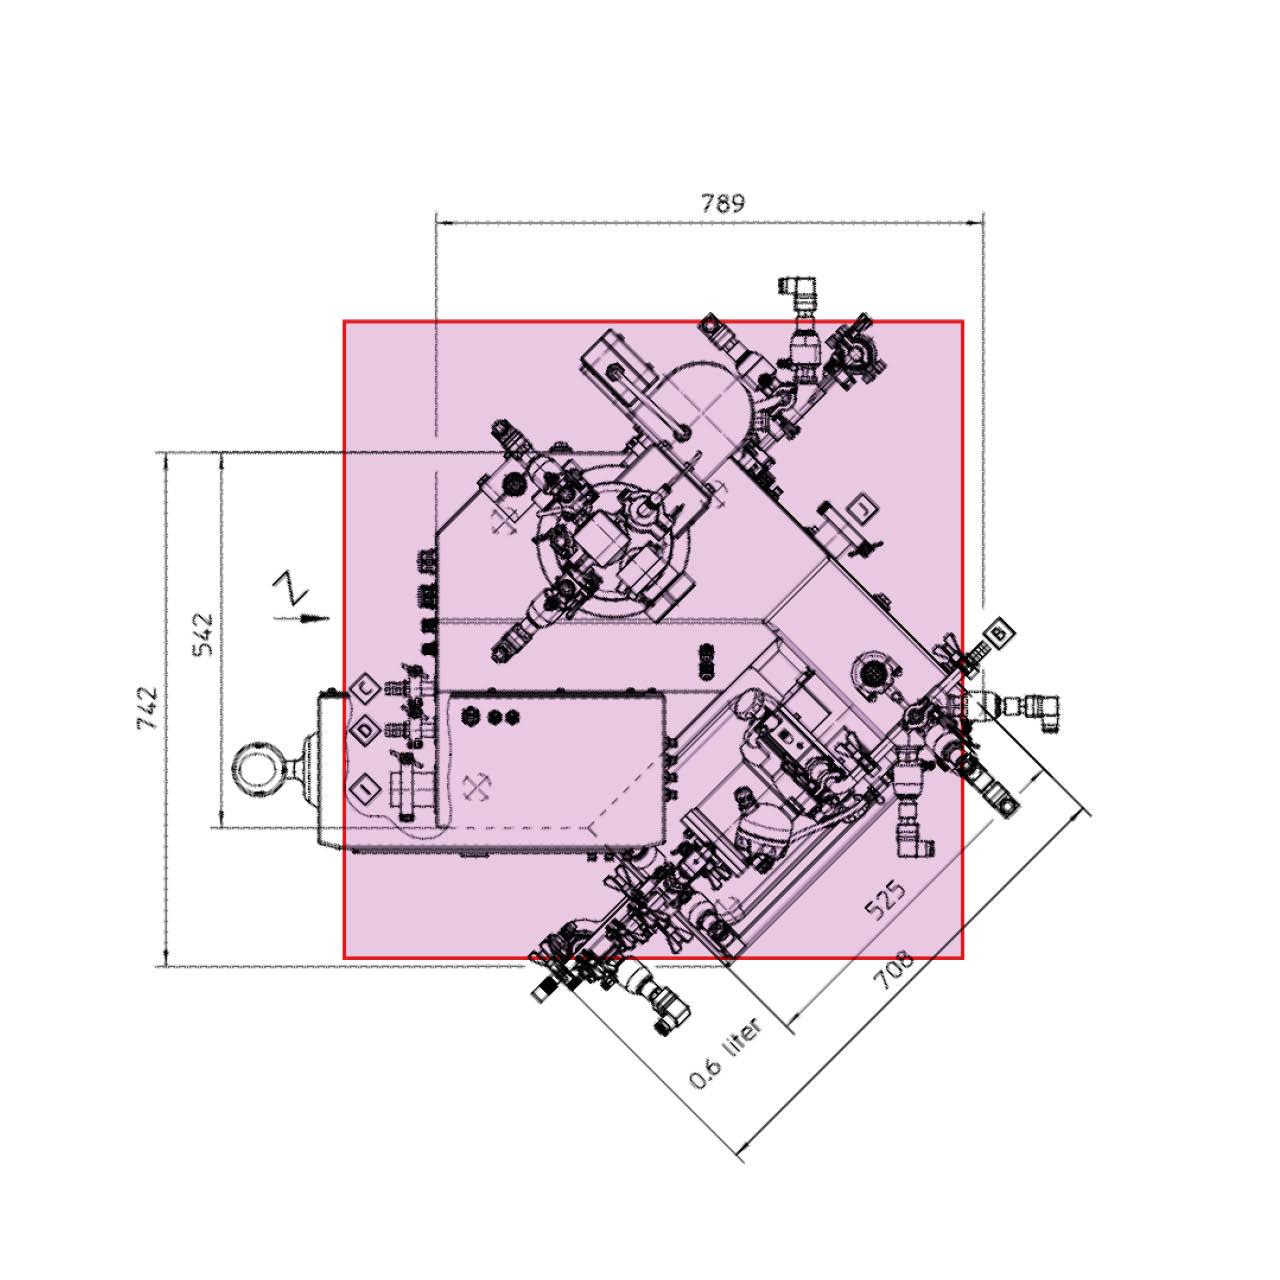 WAB Messestand Planungsskizze Podest für Exponat